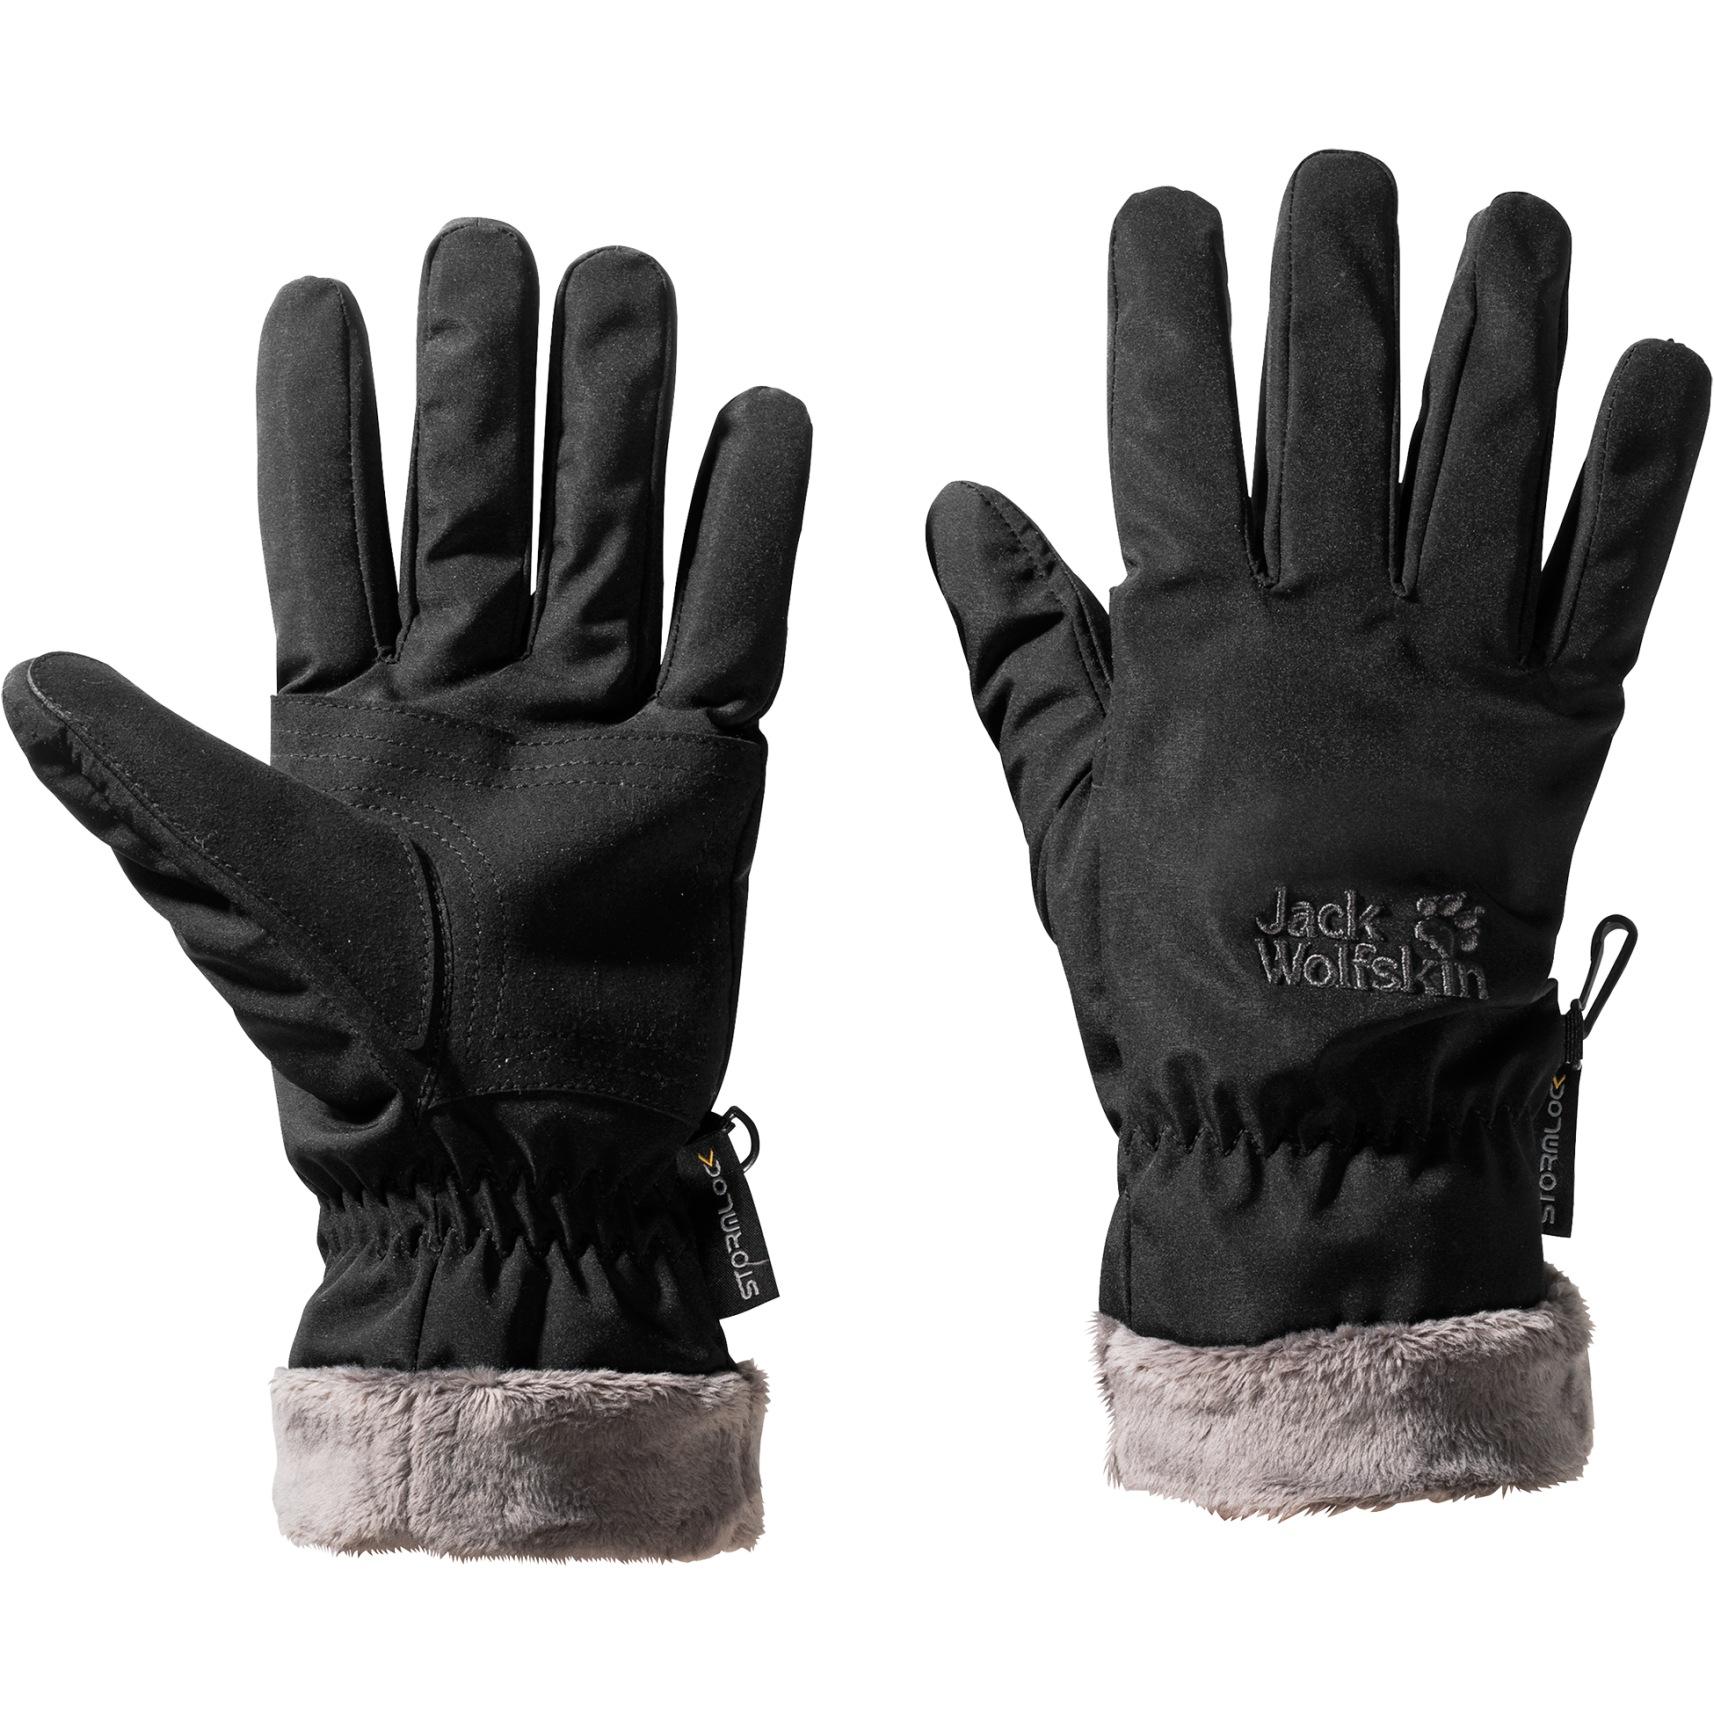 Picture of Jack Wolfskin Stormlock Highloft Glove Women - black